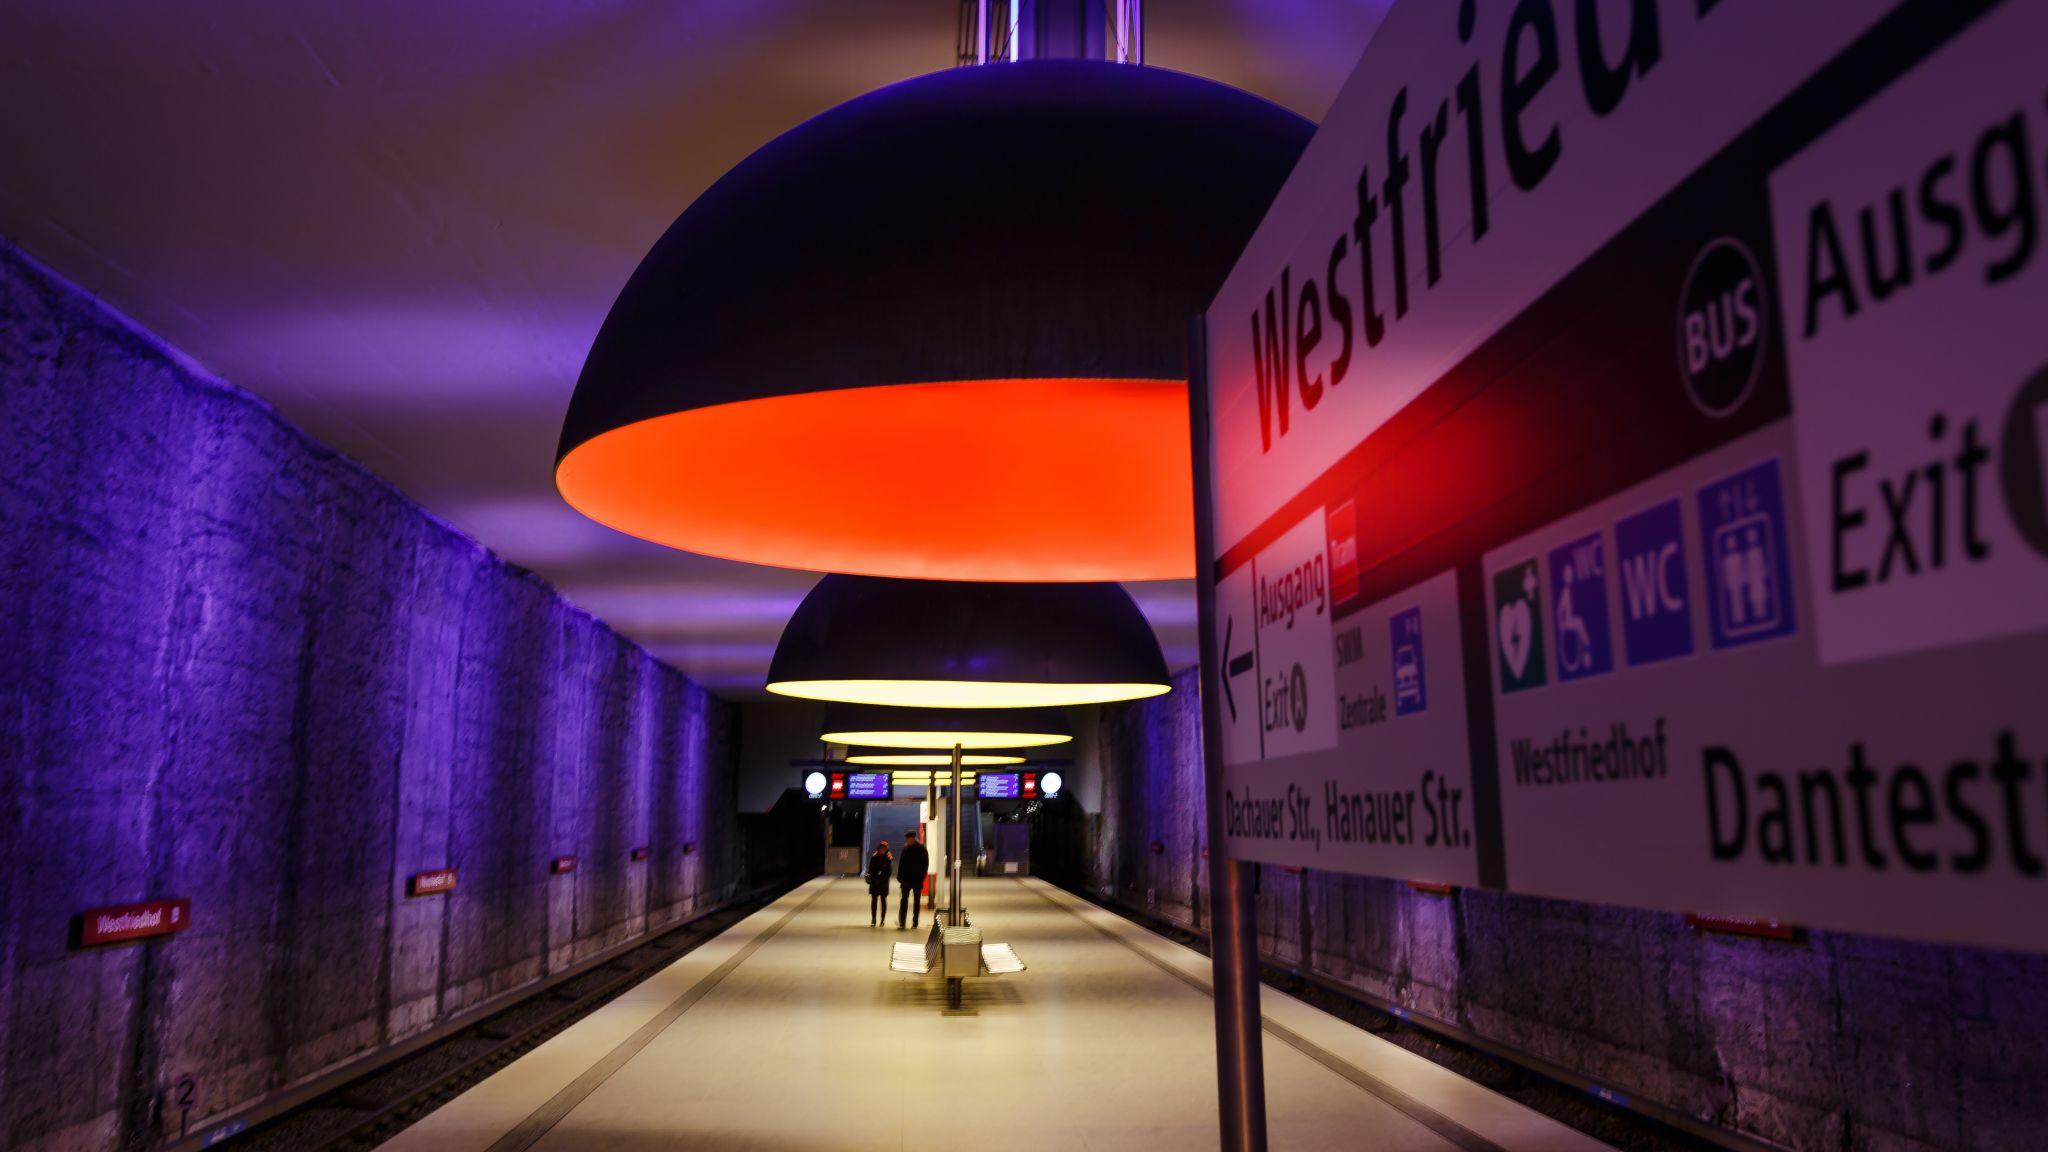 Subway station Westfriedhof, Germany